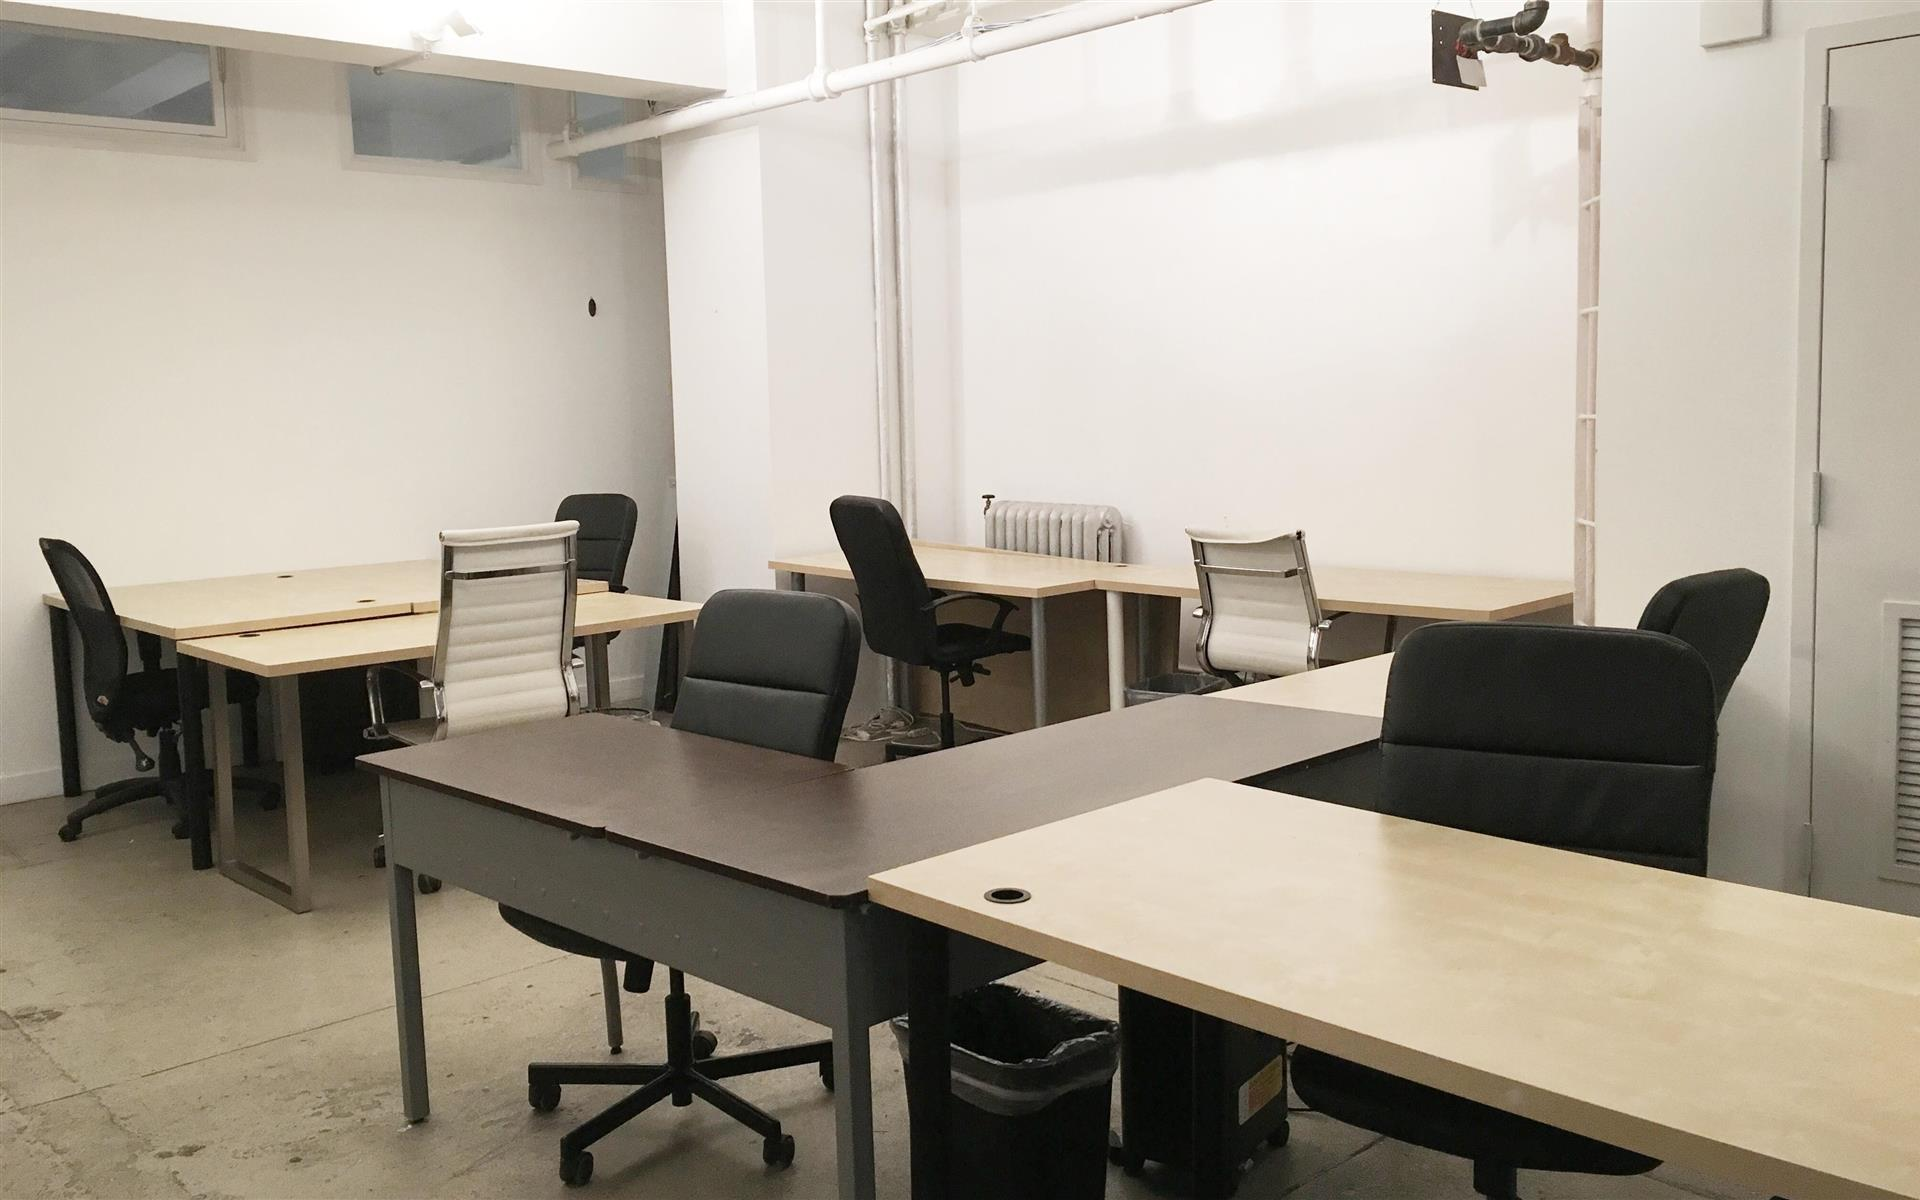 Apploi - Team Office - Amazing Midtown Open Space